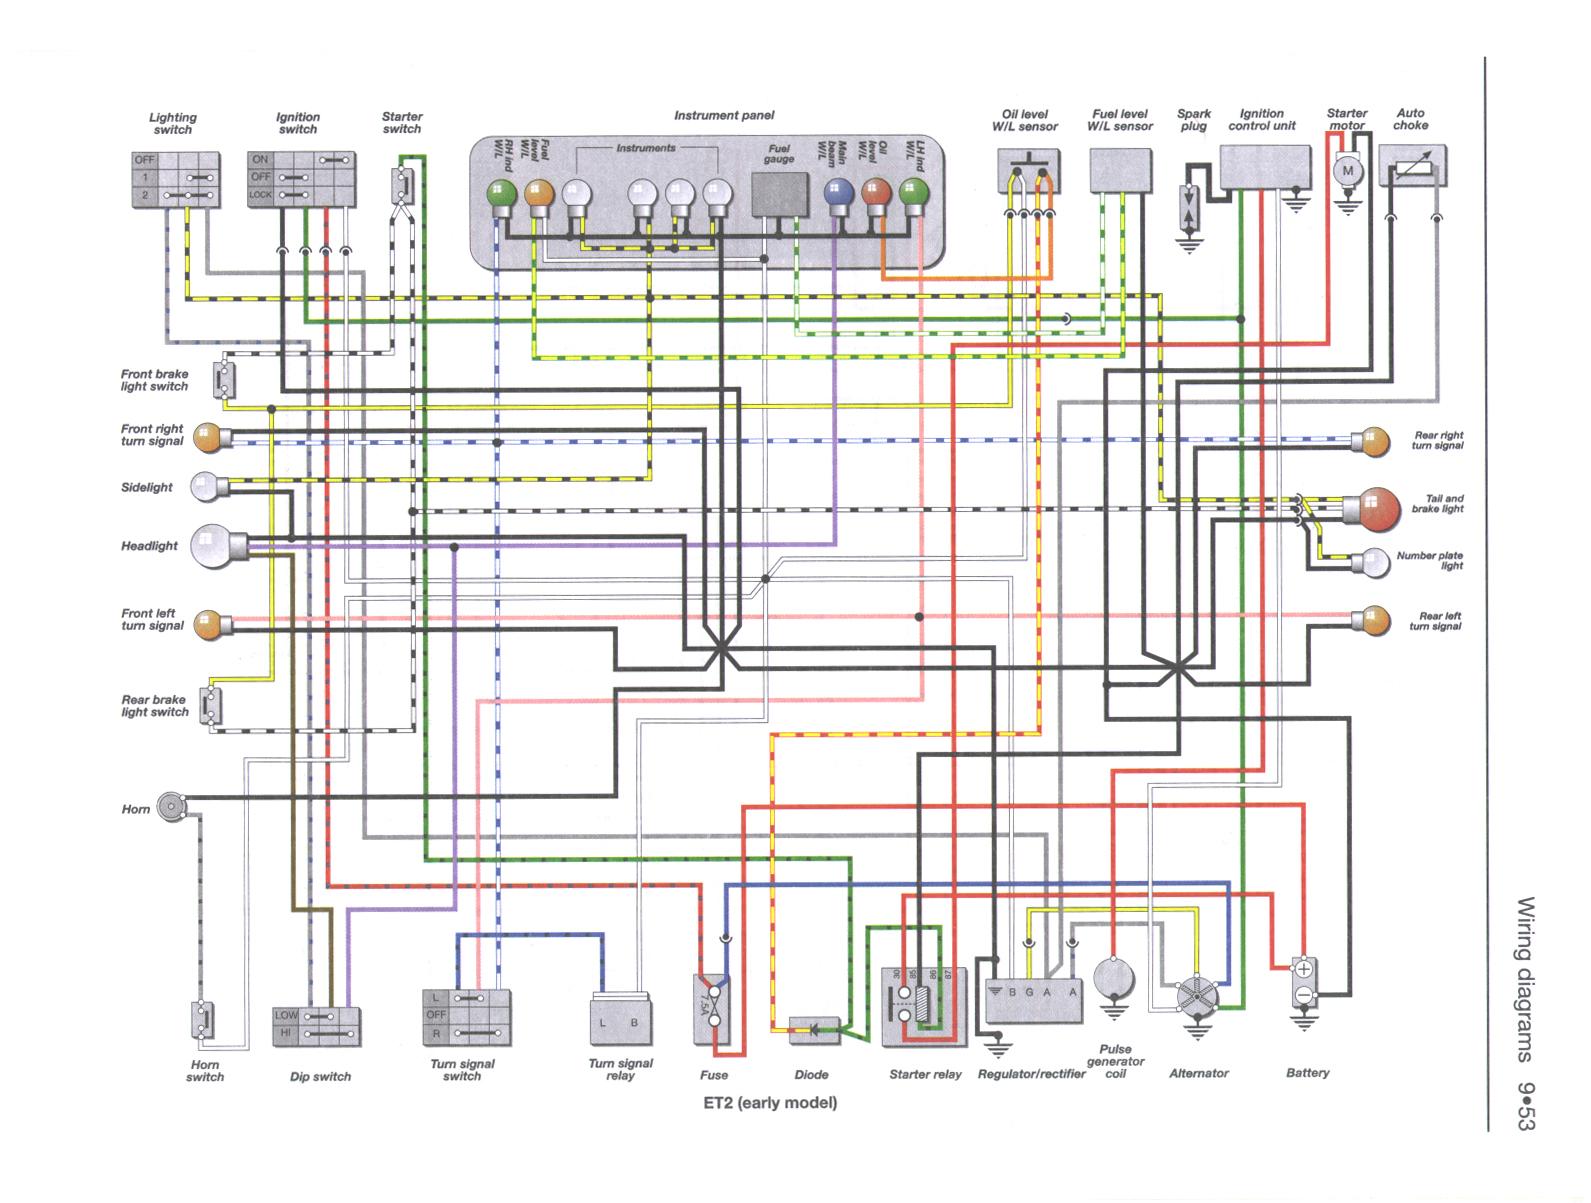 DIAGRAM] Vespa Lx 150 Wiring Diagram FULL Version HD Quality Wiring Diagram  - 05081356ACCWIRING.CONTOROCK.ITCONTO ROCK